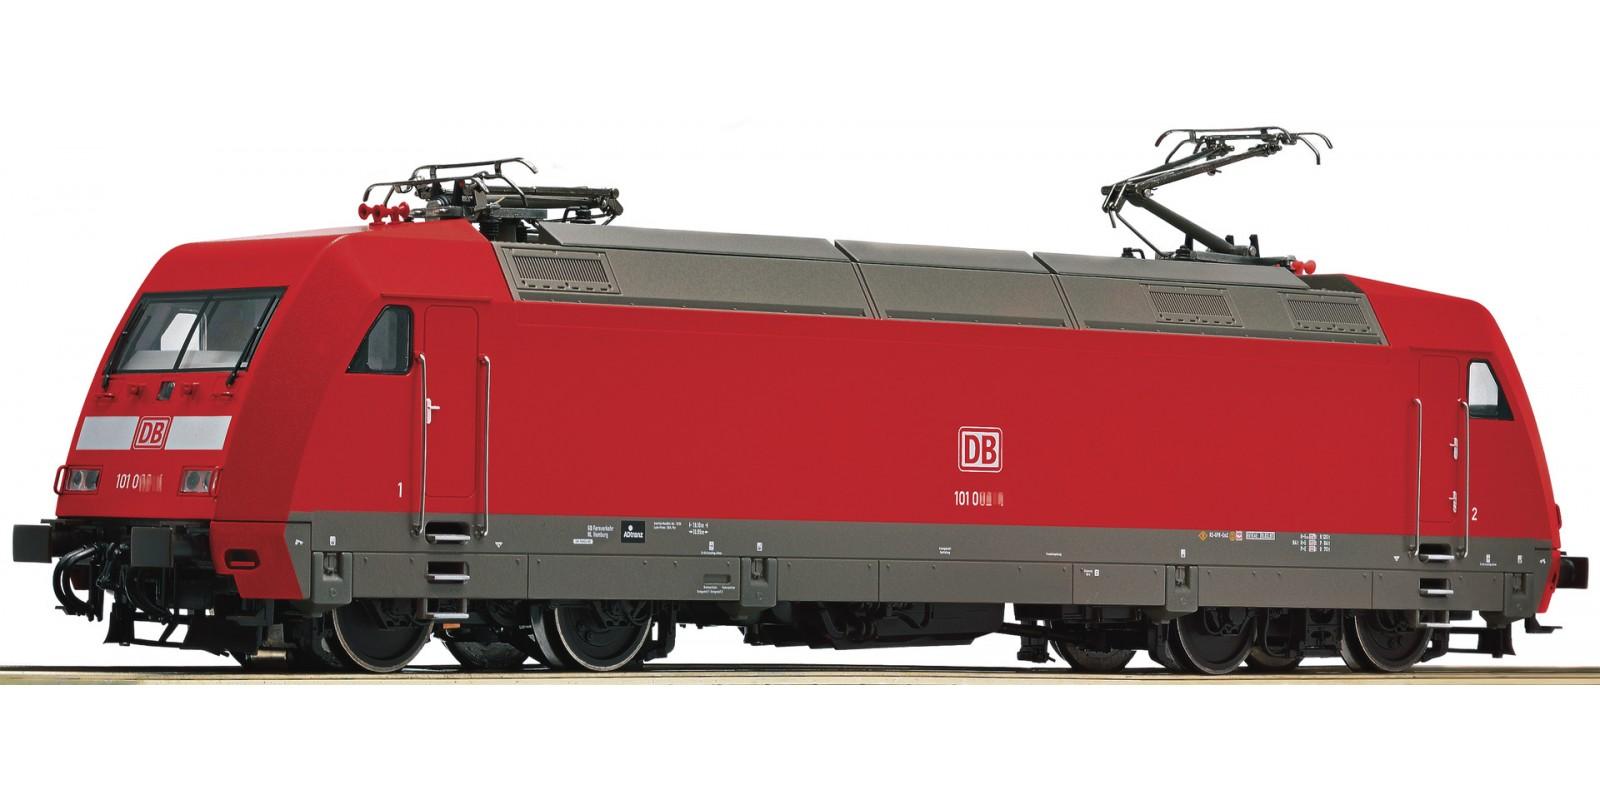 RO79556 - Electric locomotive class 101, DB AG